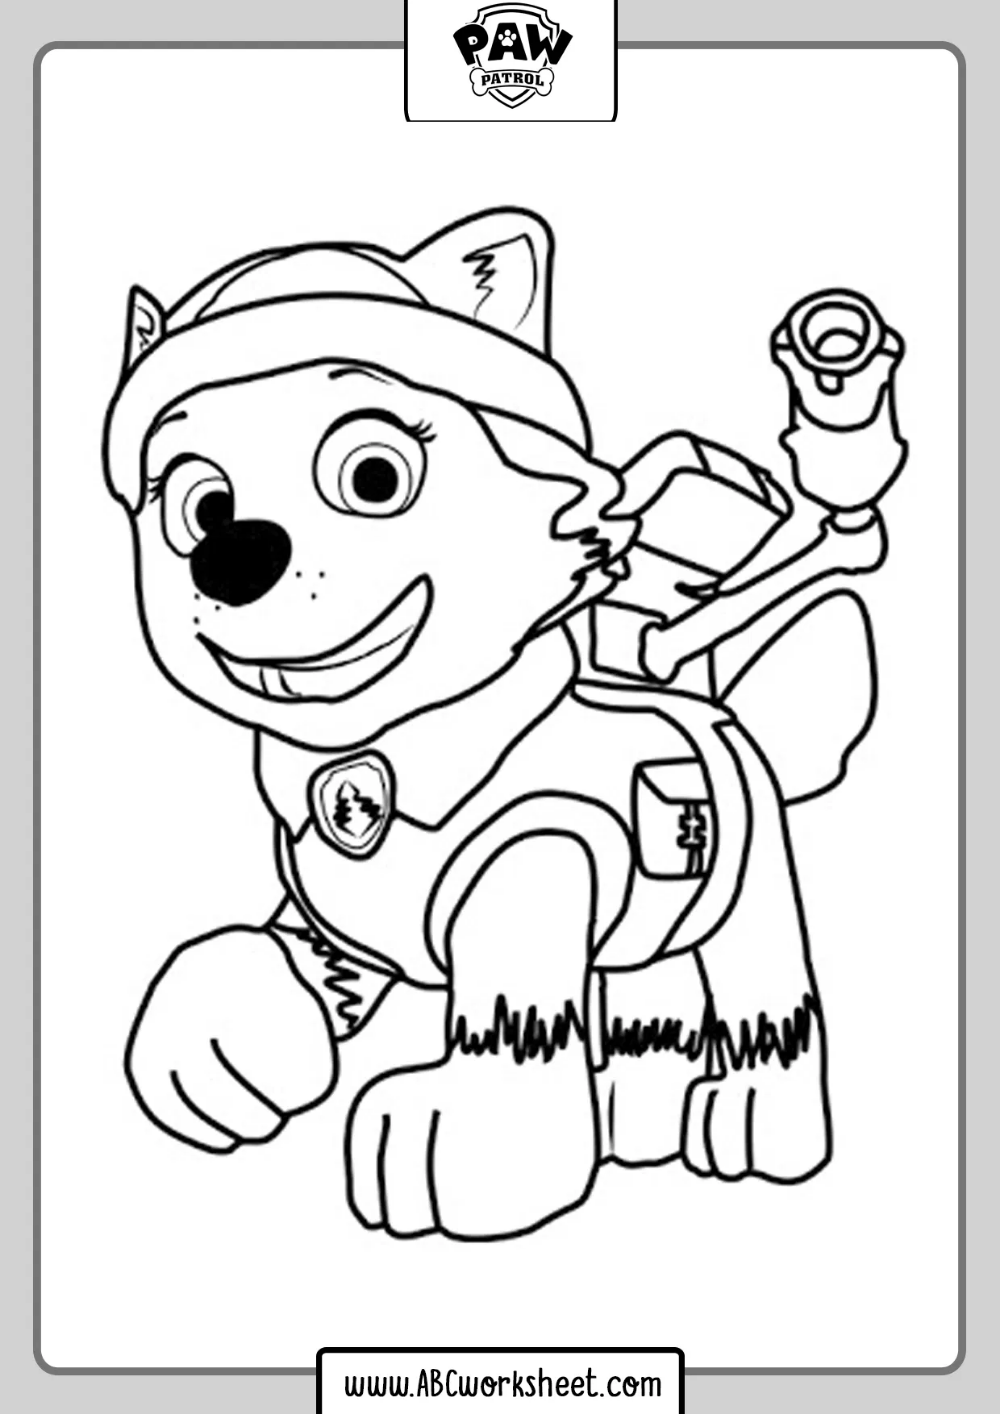 Printable Paw Patrol Drawings Paw Patrol Coloring Pages Paw Patrol Coloring Abc Coloring Pages [ 1414 x 1000 Pixel ]